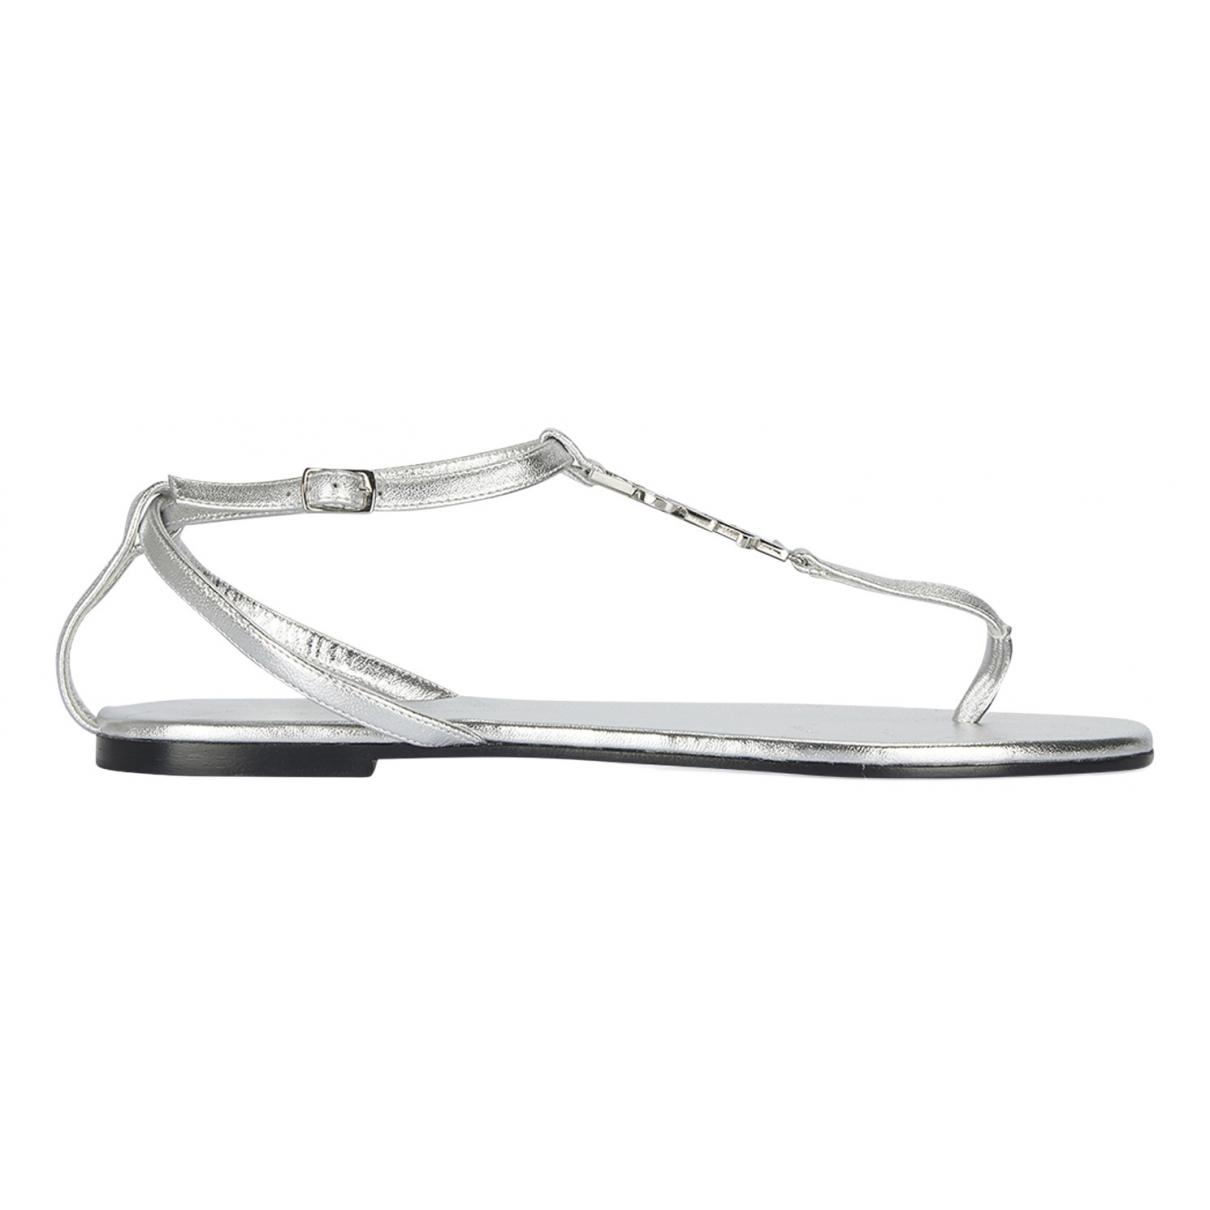 Saint Laurent N Silver Leather Sandals for Women 4.5 UK